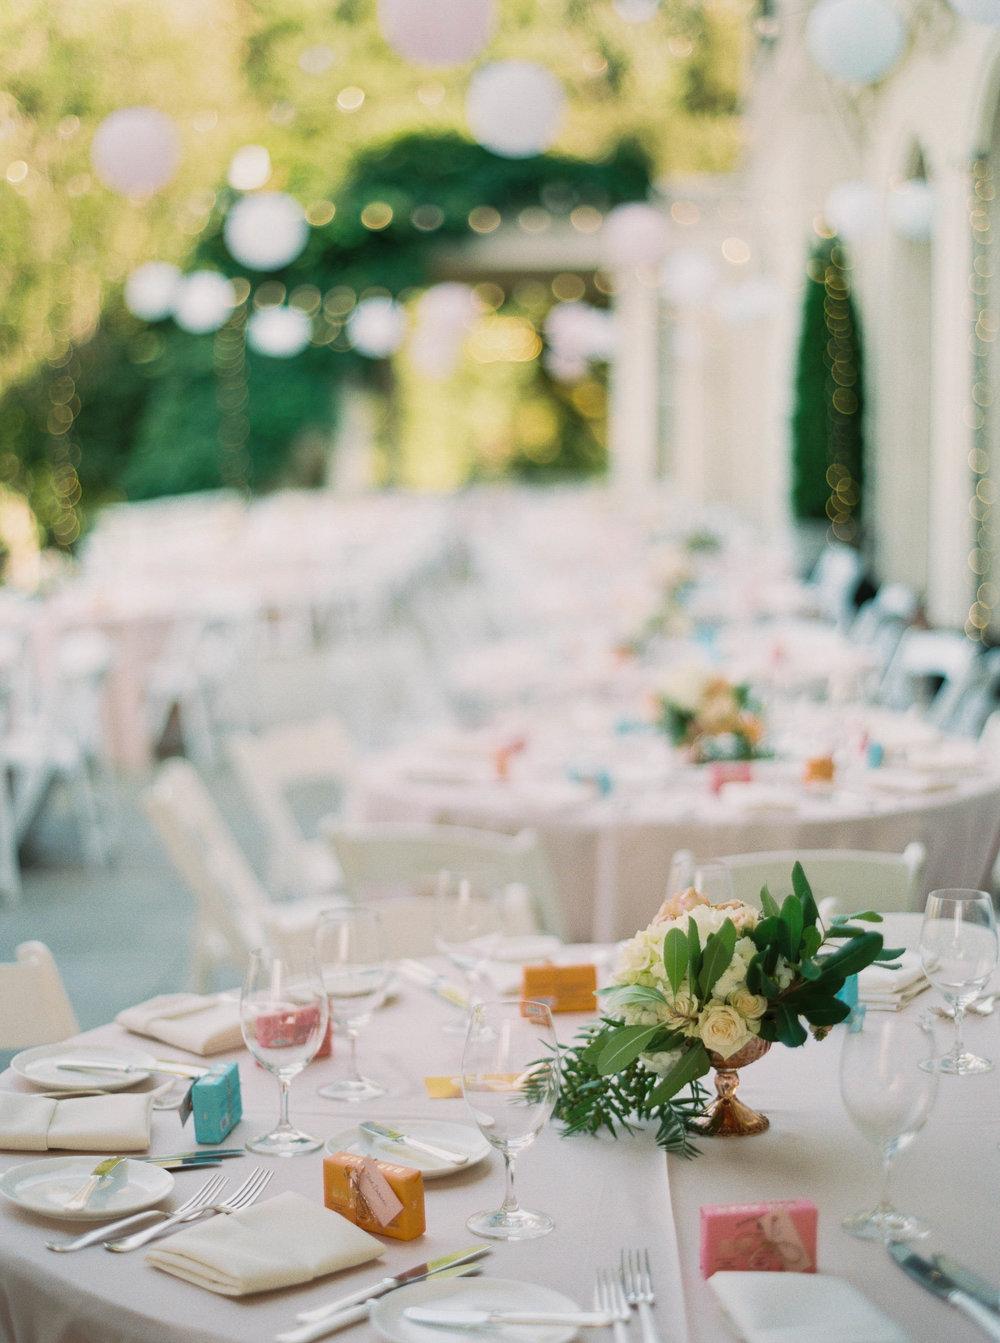 Villa_Montalvo_Wedding_Photographer_Videographer_San_Francisco135.jpg